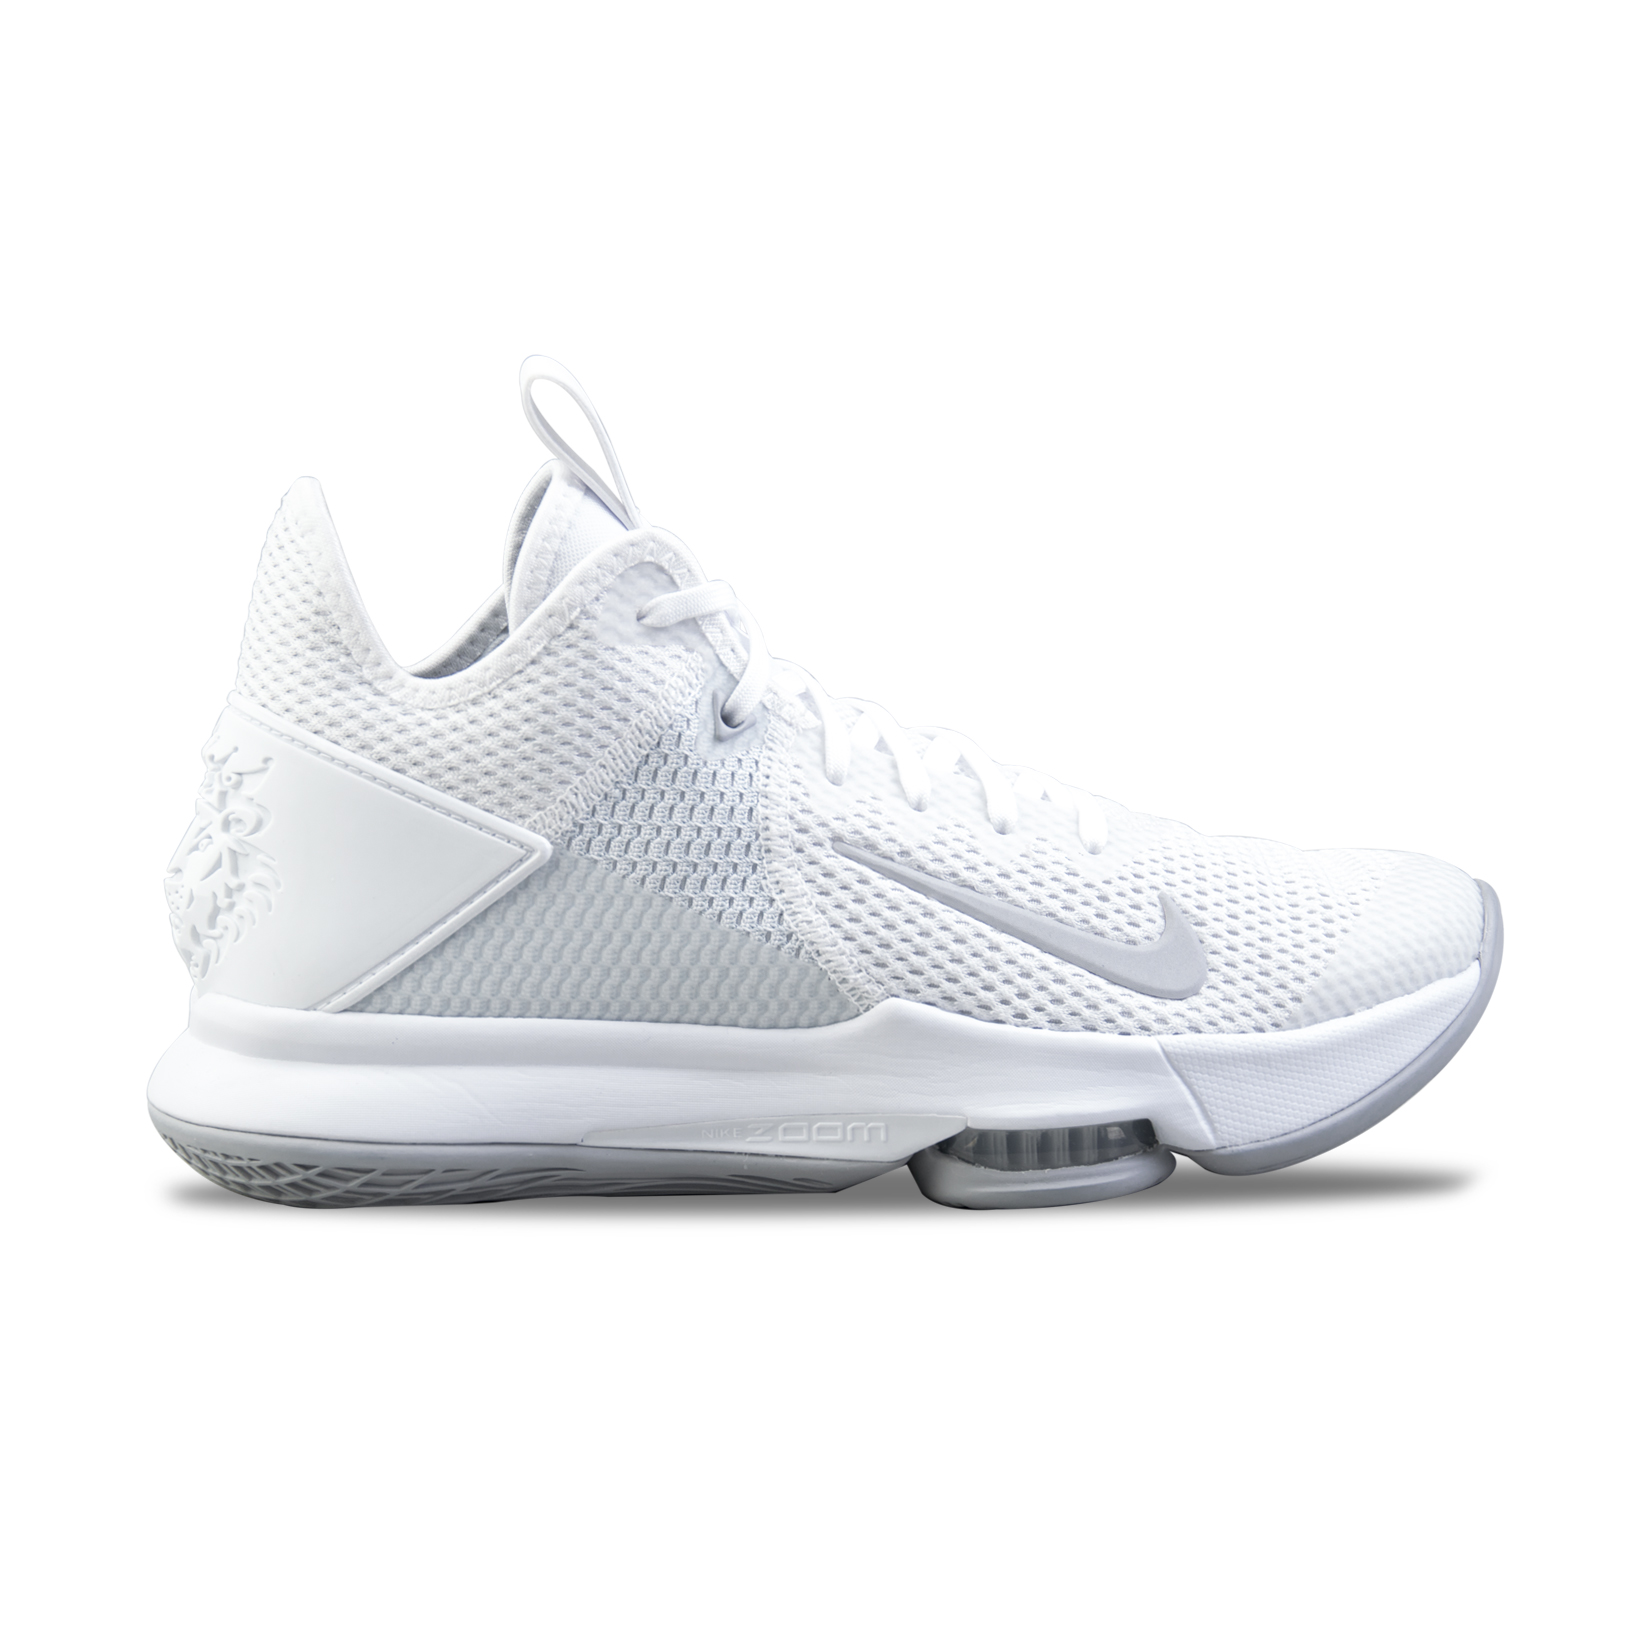 Nike LeBron Witness 4 Team White